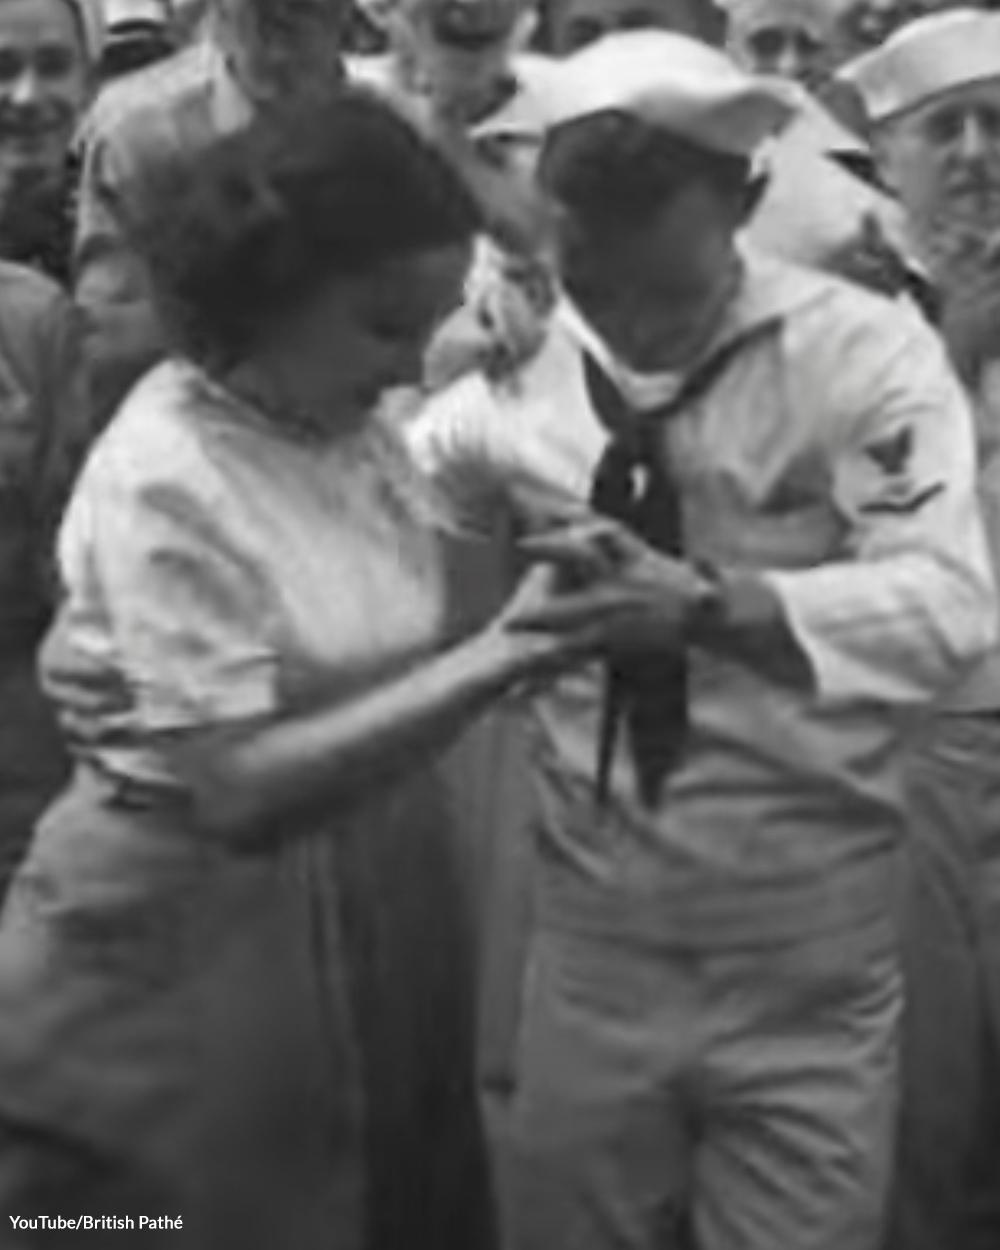 VJ Day is celebrated on September 2, 1945.